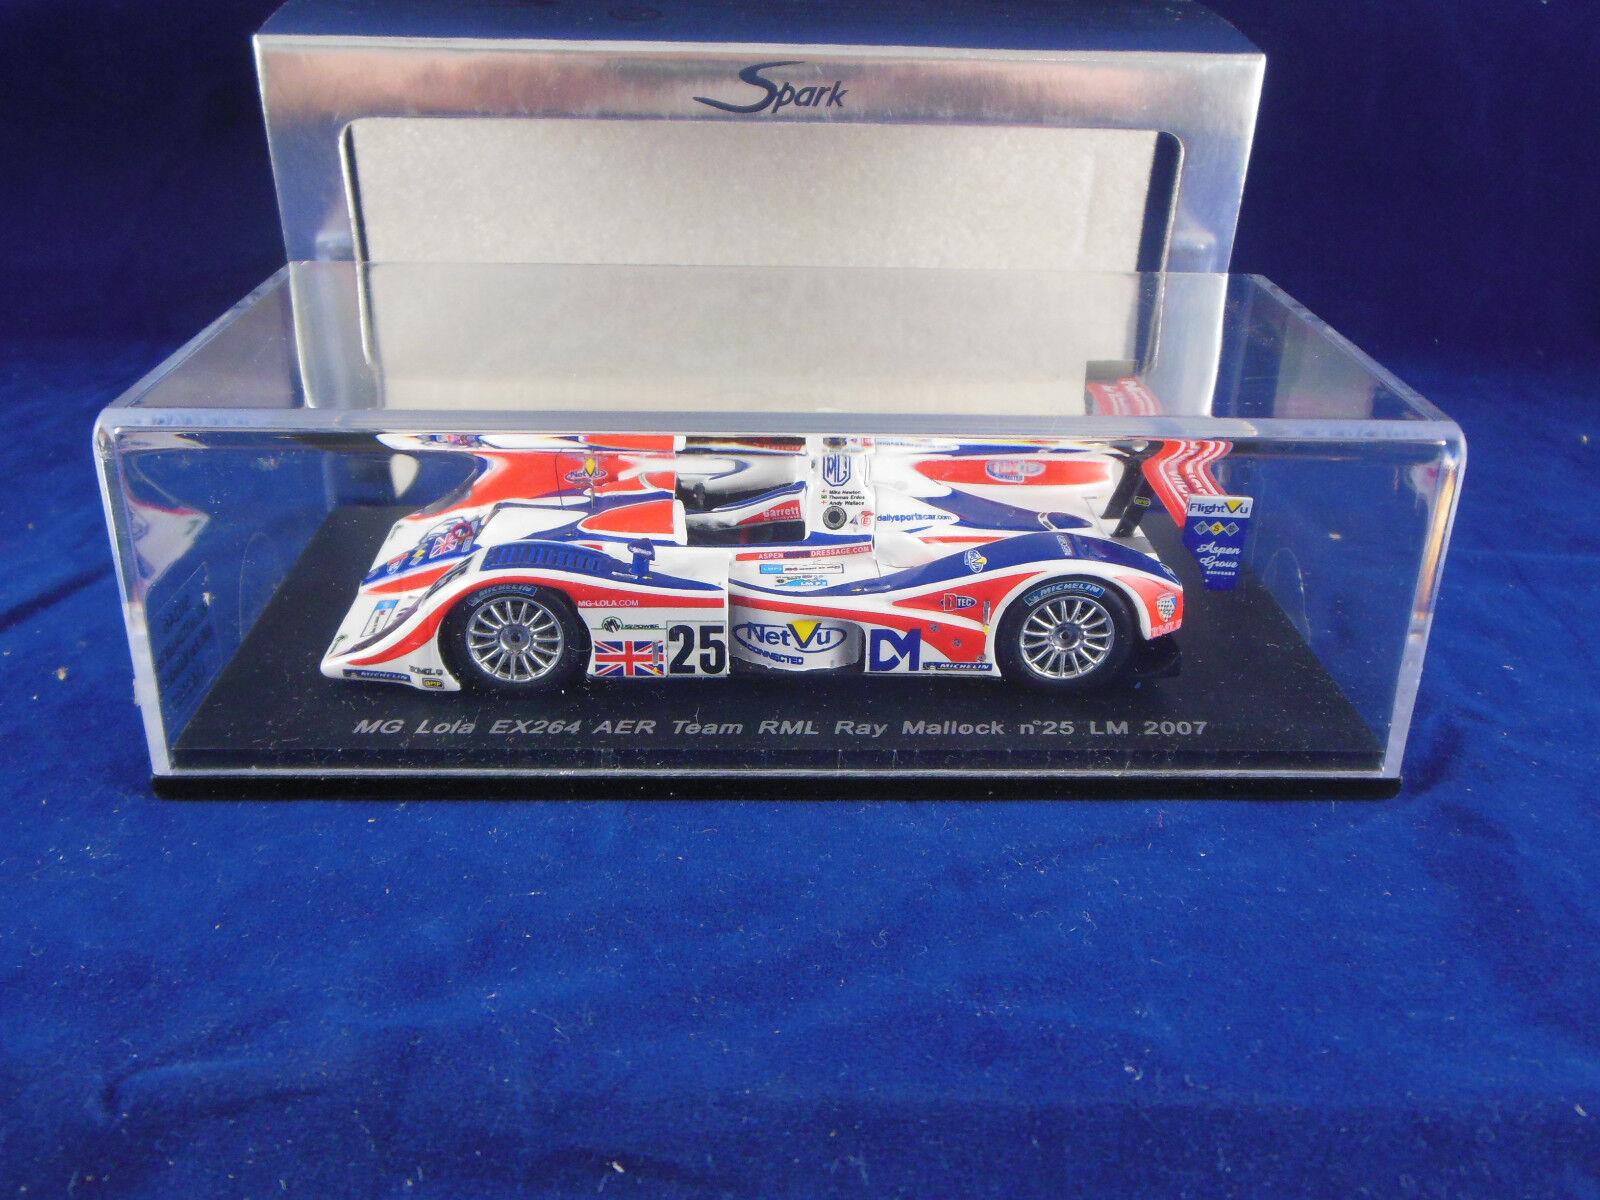 SPARK MINIMAX S0246 MG Lola EX264 AER Team RML  25 LE MANS 2007 T Erdos Nuovoton